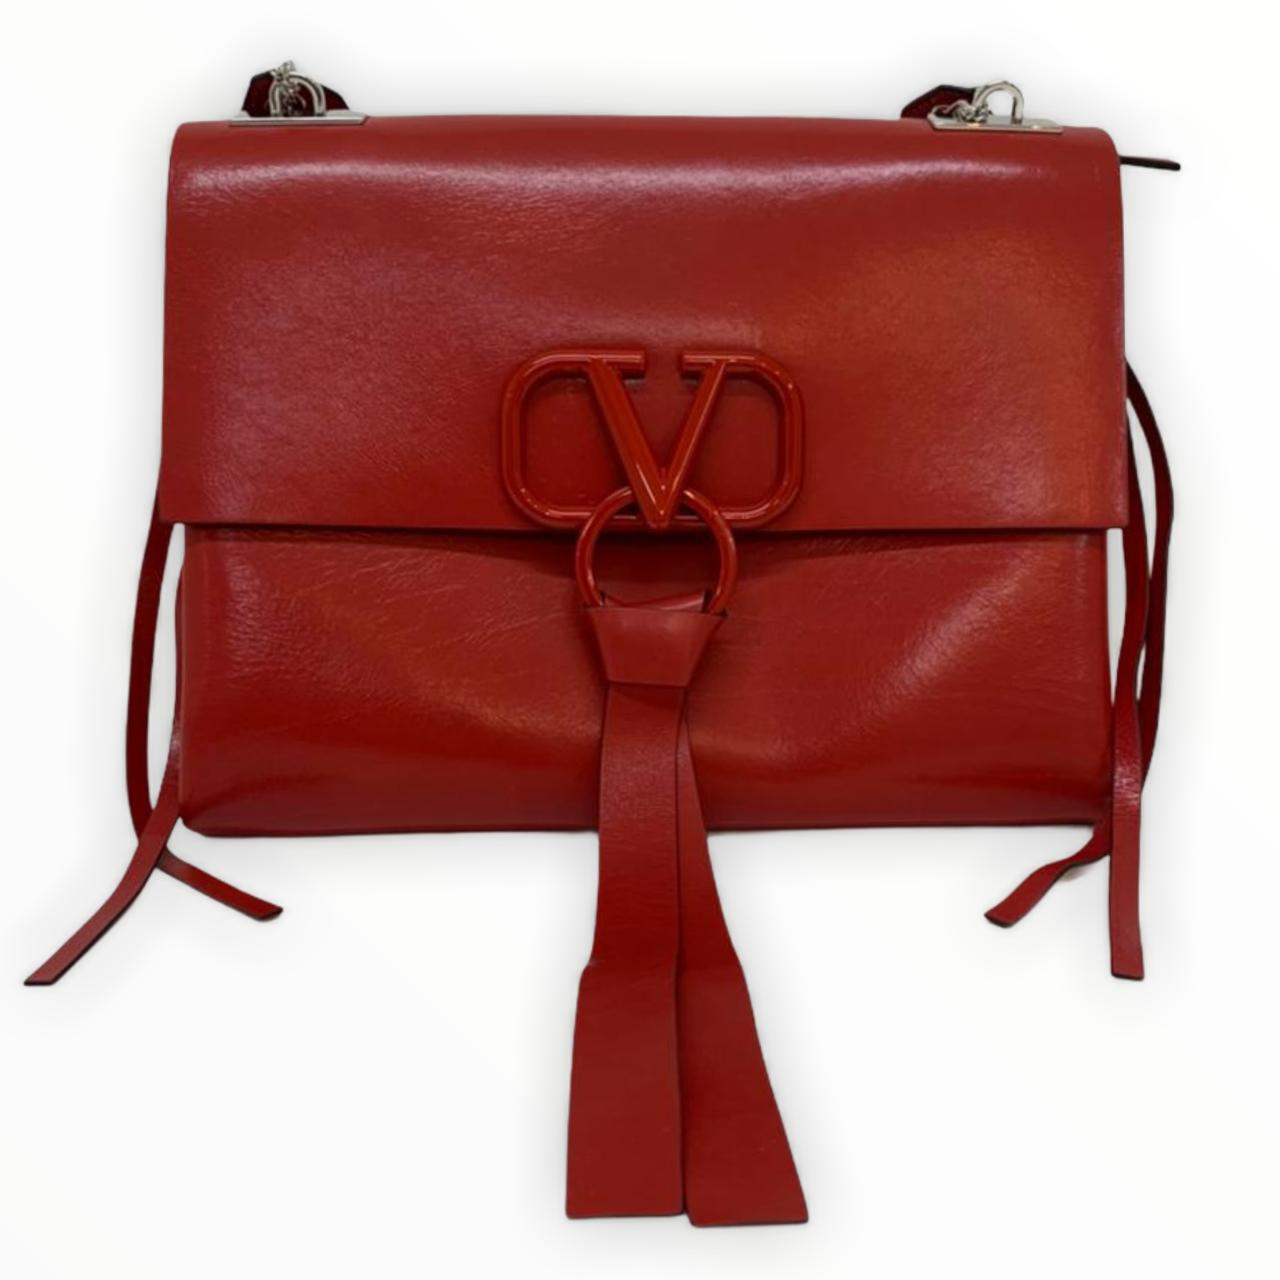 Bolsa Valentino VRing Vermelha